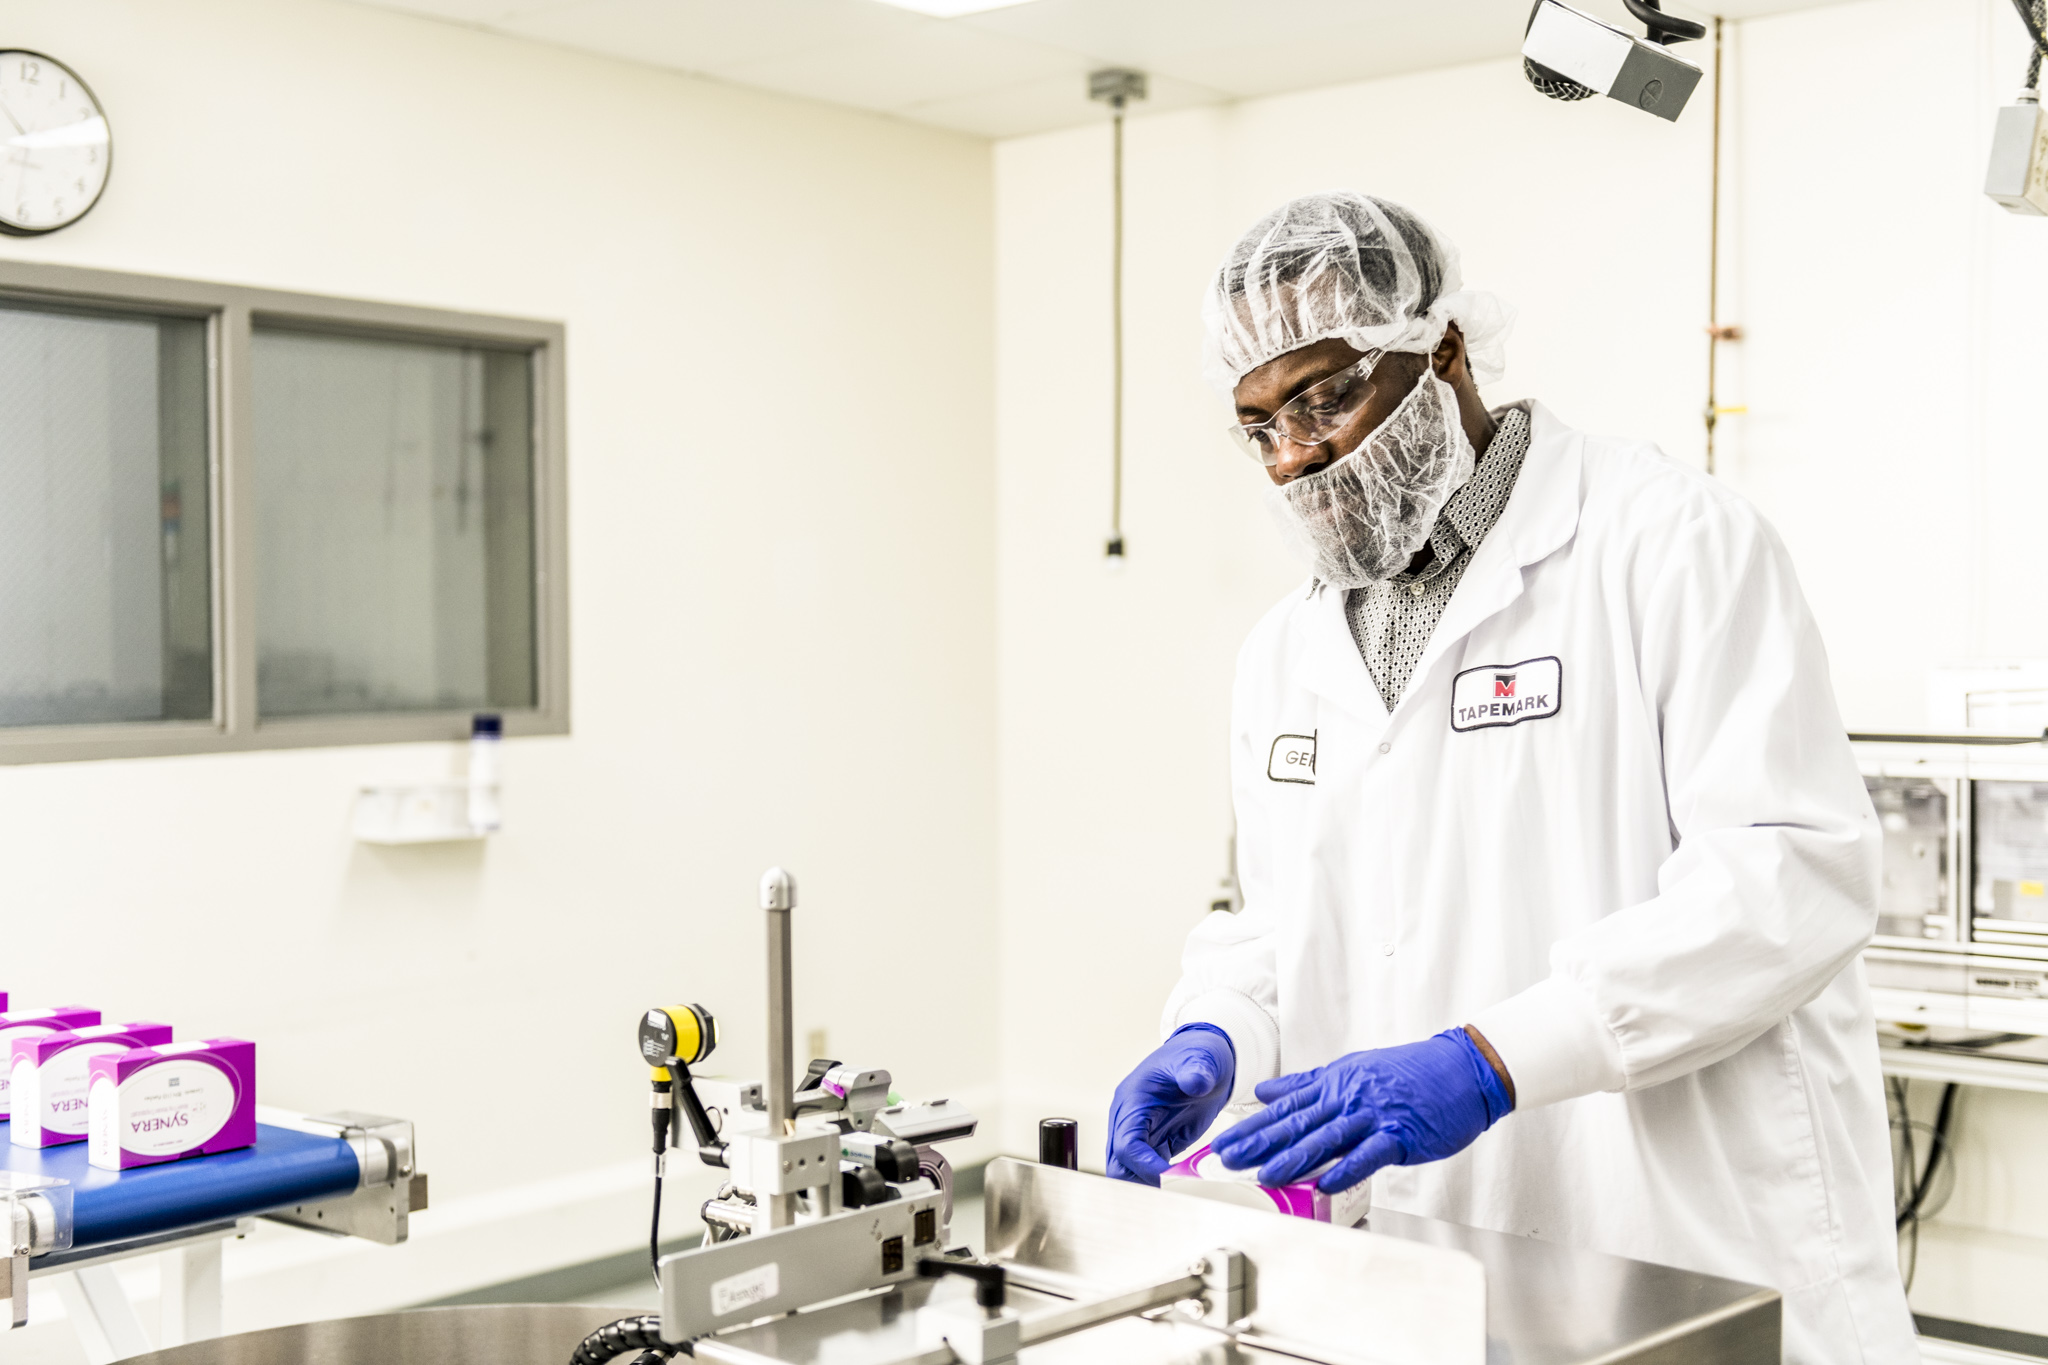 Tapemark employee working on pharmaceutical serialization